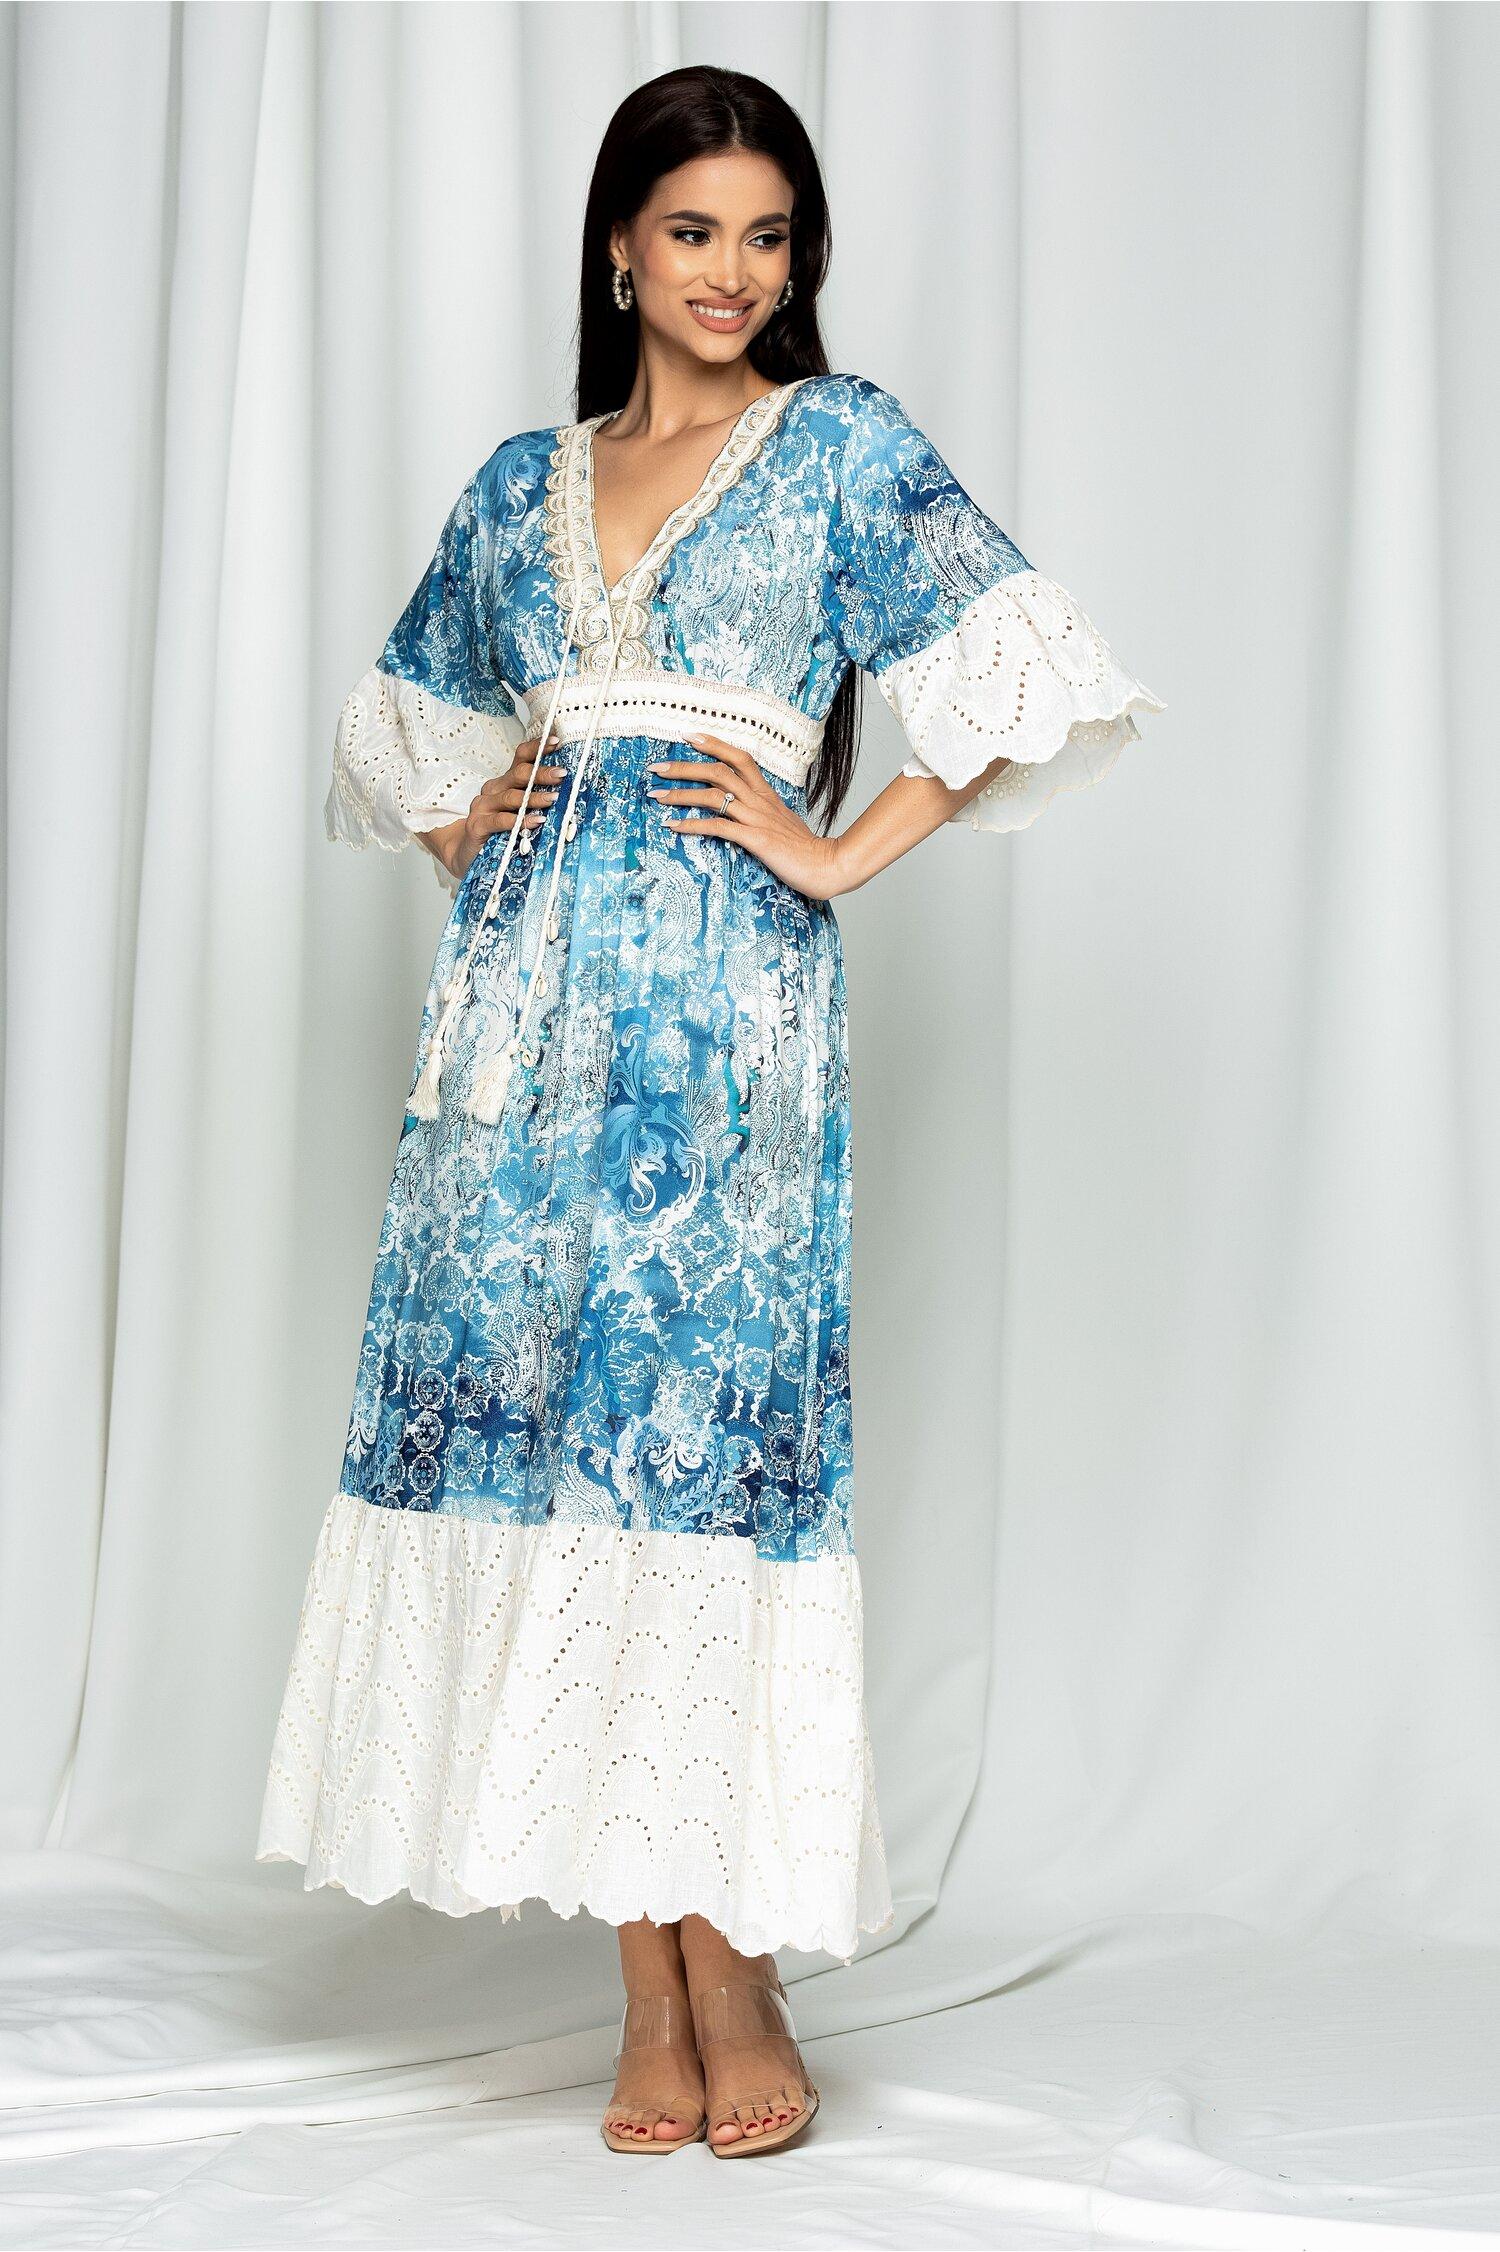 Rochie lunga de vara Elisa albastra cu perforatii si snur la decolteu